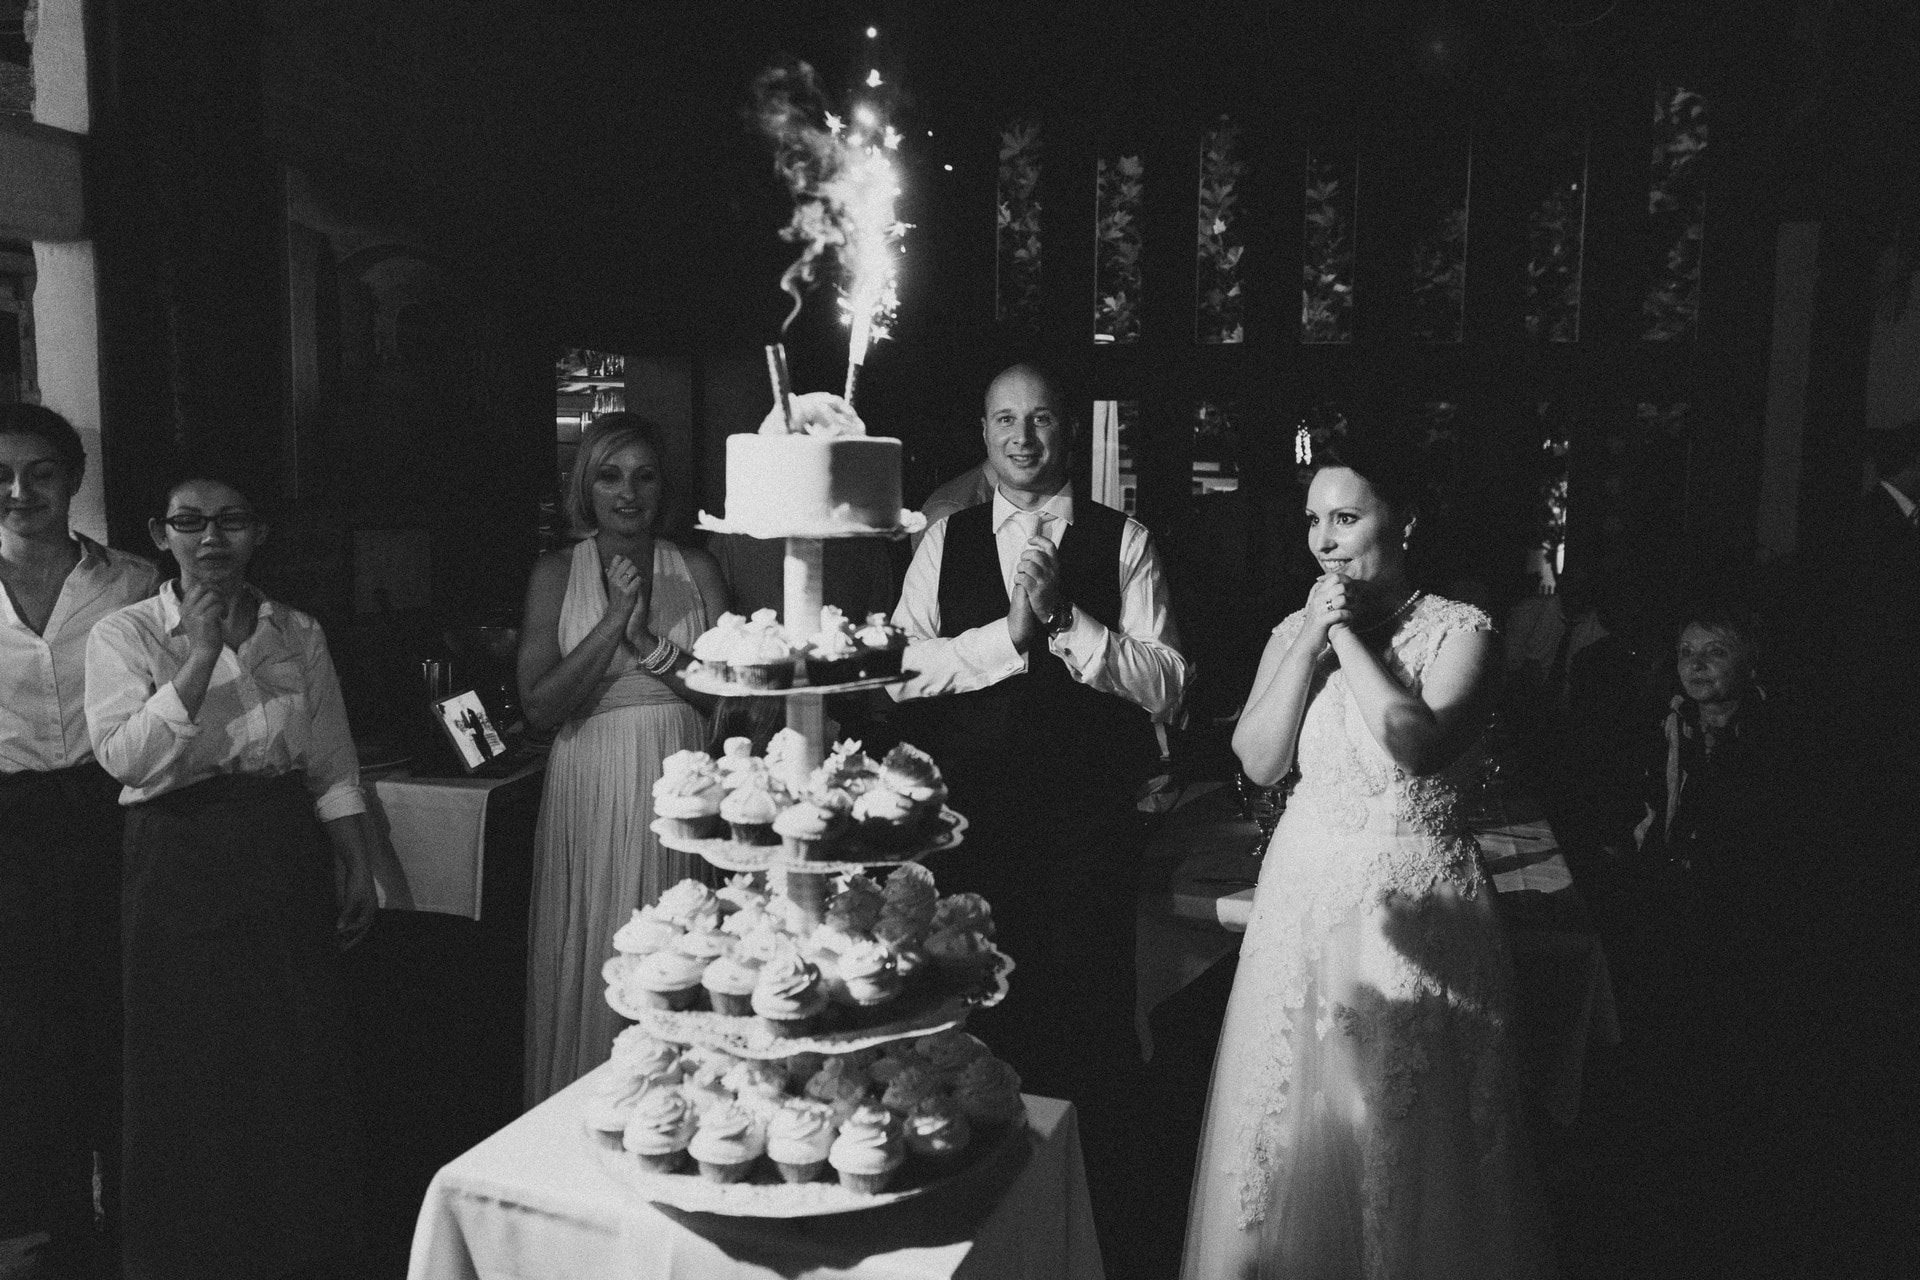 Hochzeitsreportage birnauer oberhof tortenanschnitt brautpaar